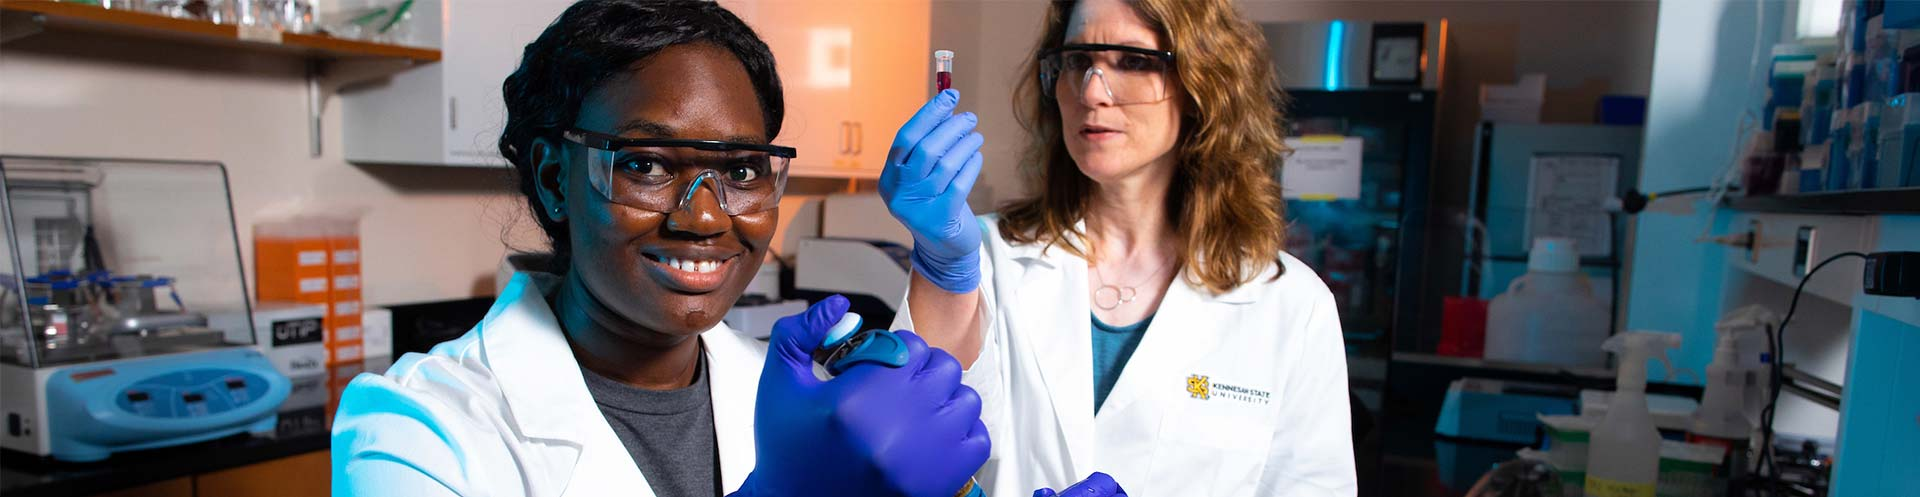 Summer research experience inspires KSU biochemistry major